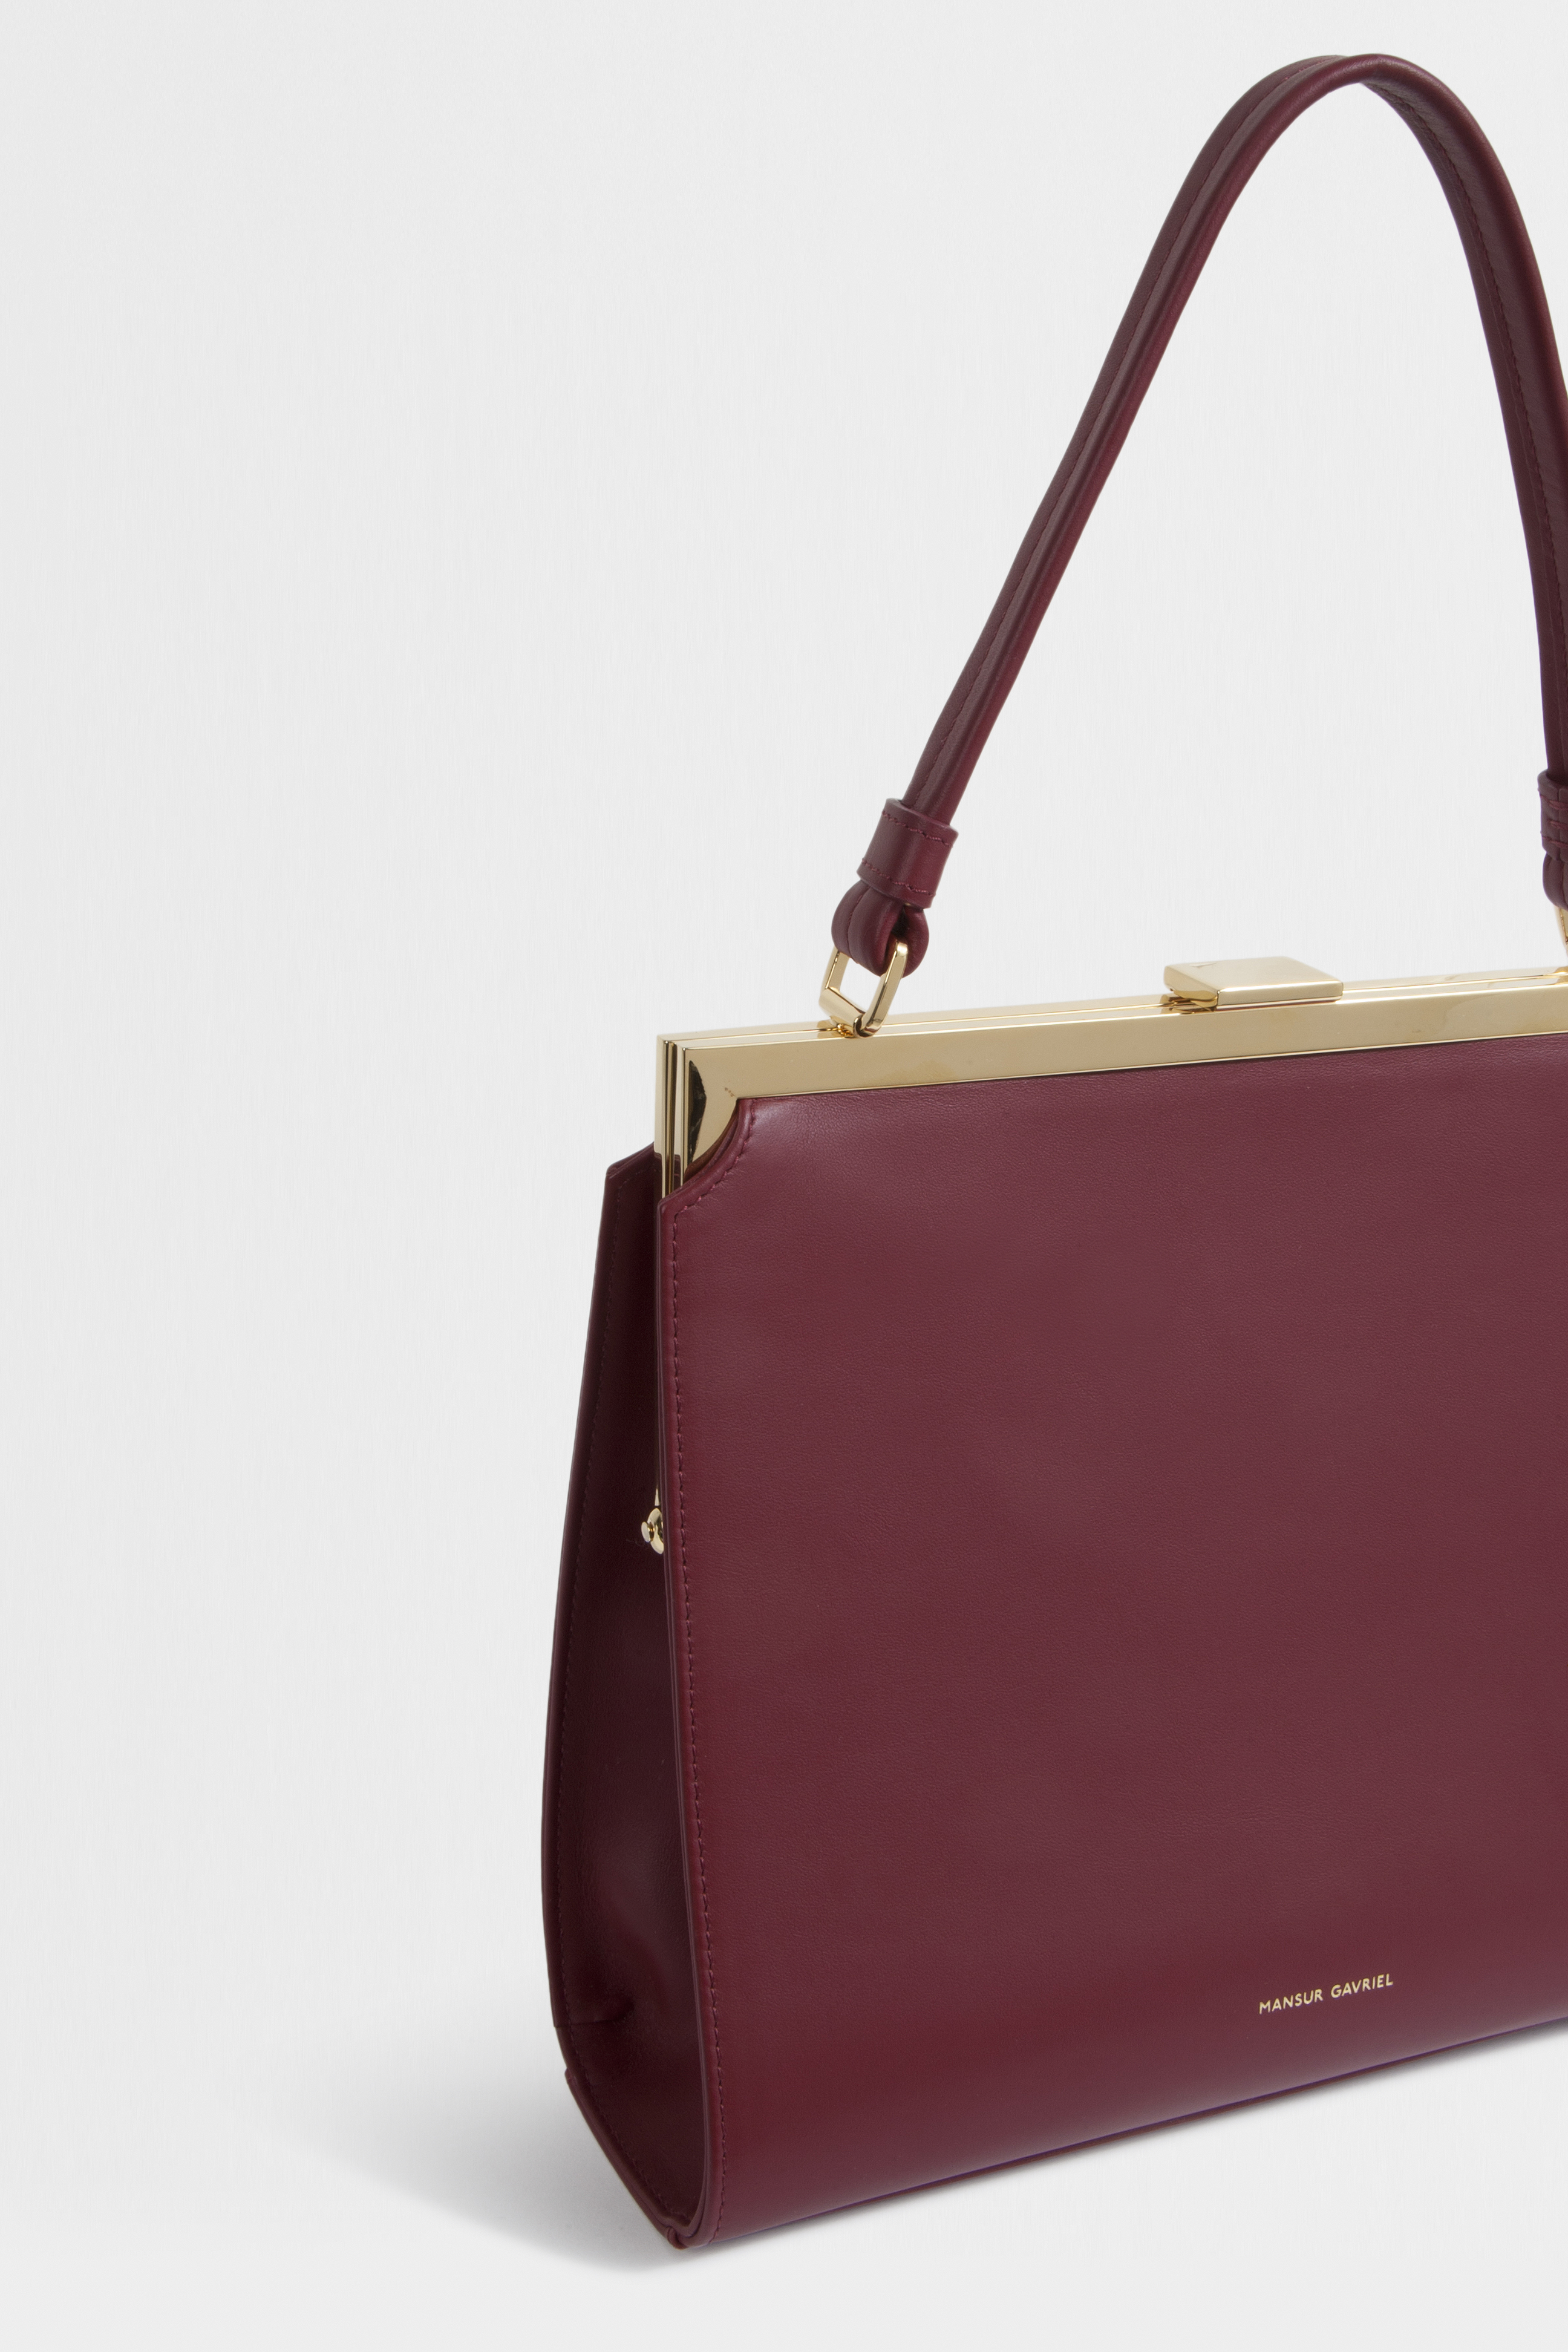 a412889973b0 Lyst - Mansur Gavriel Elegant Leather Top Handle Bag in Red